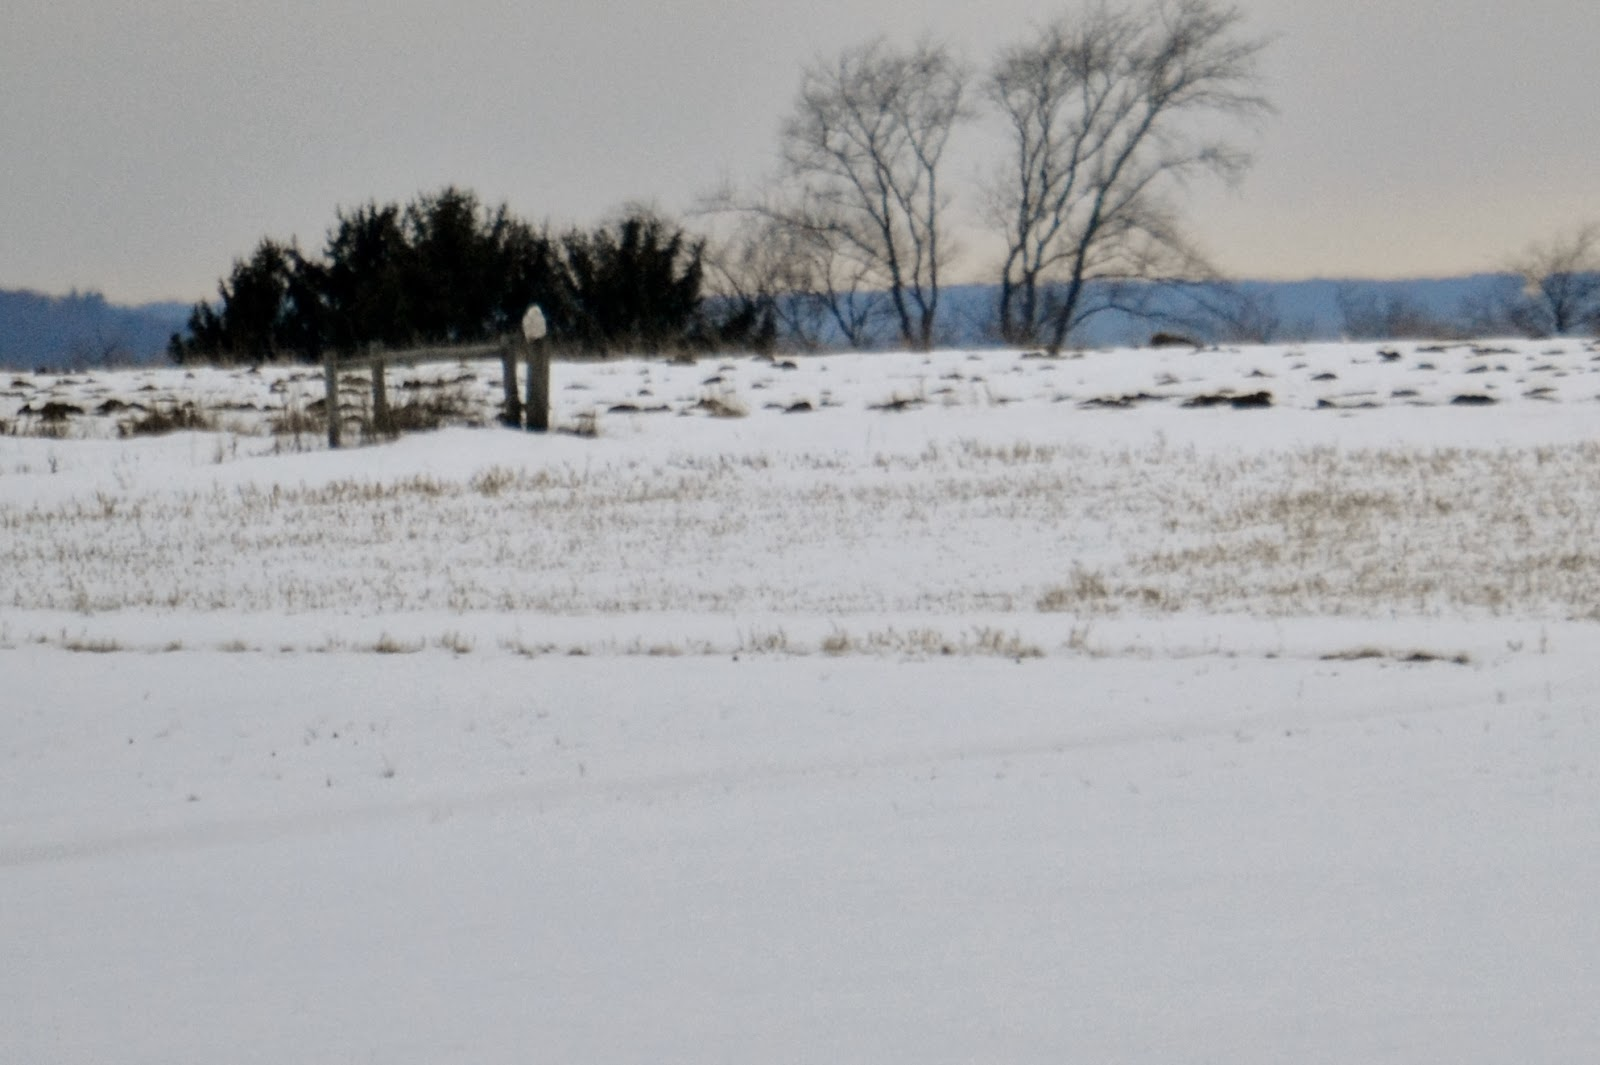 snowy owl on a fence post